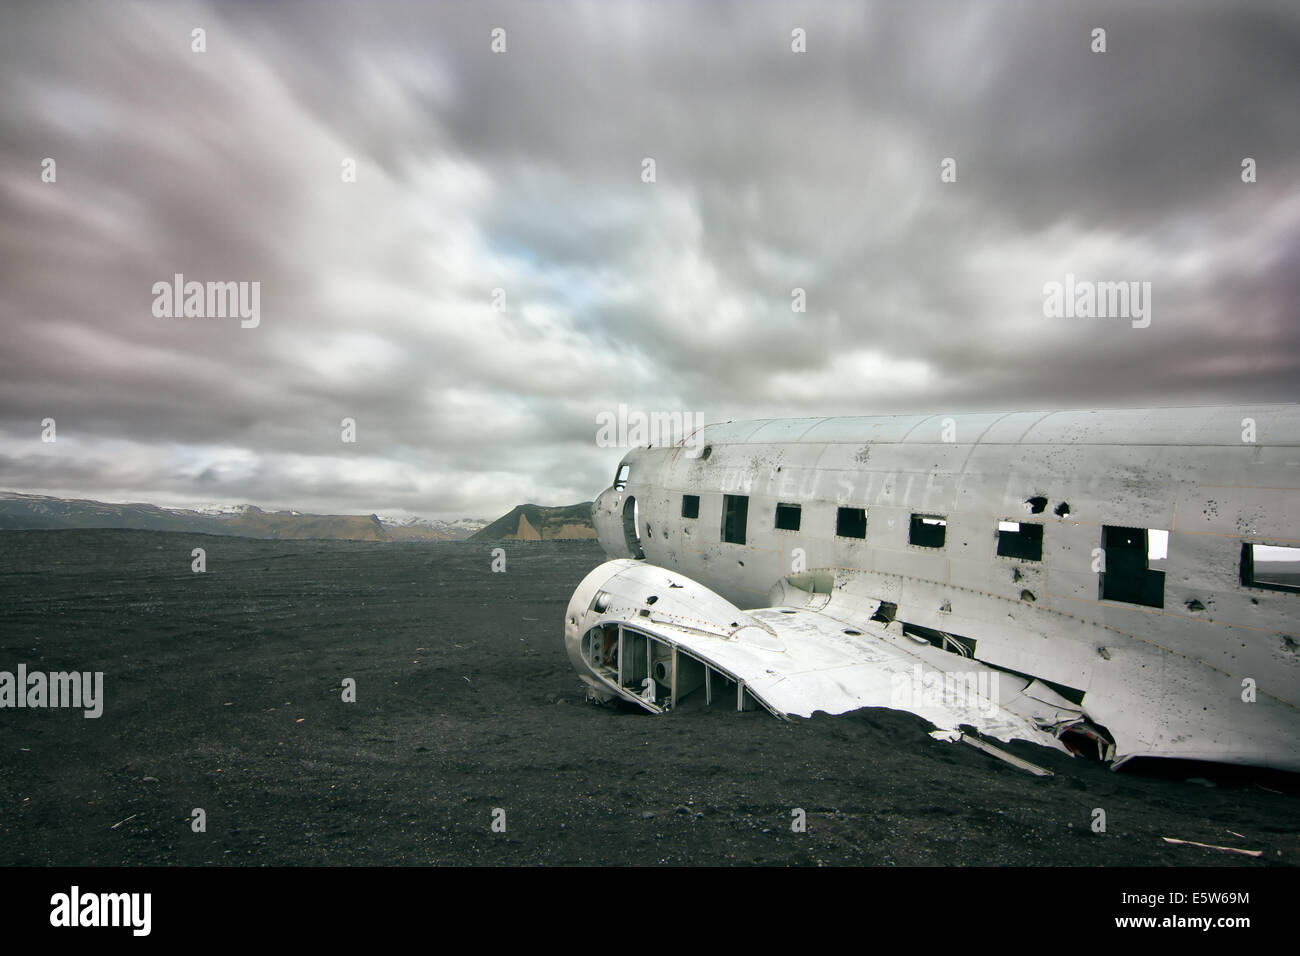 US Navy DC3 crash - Stock Image